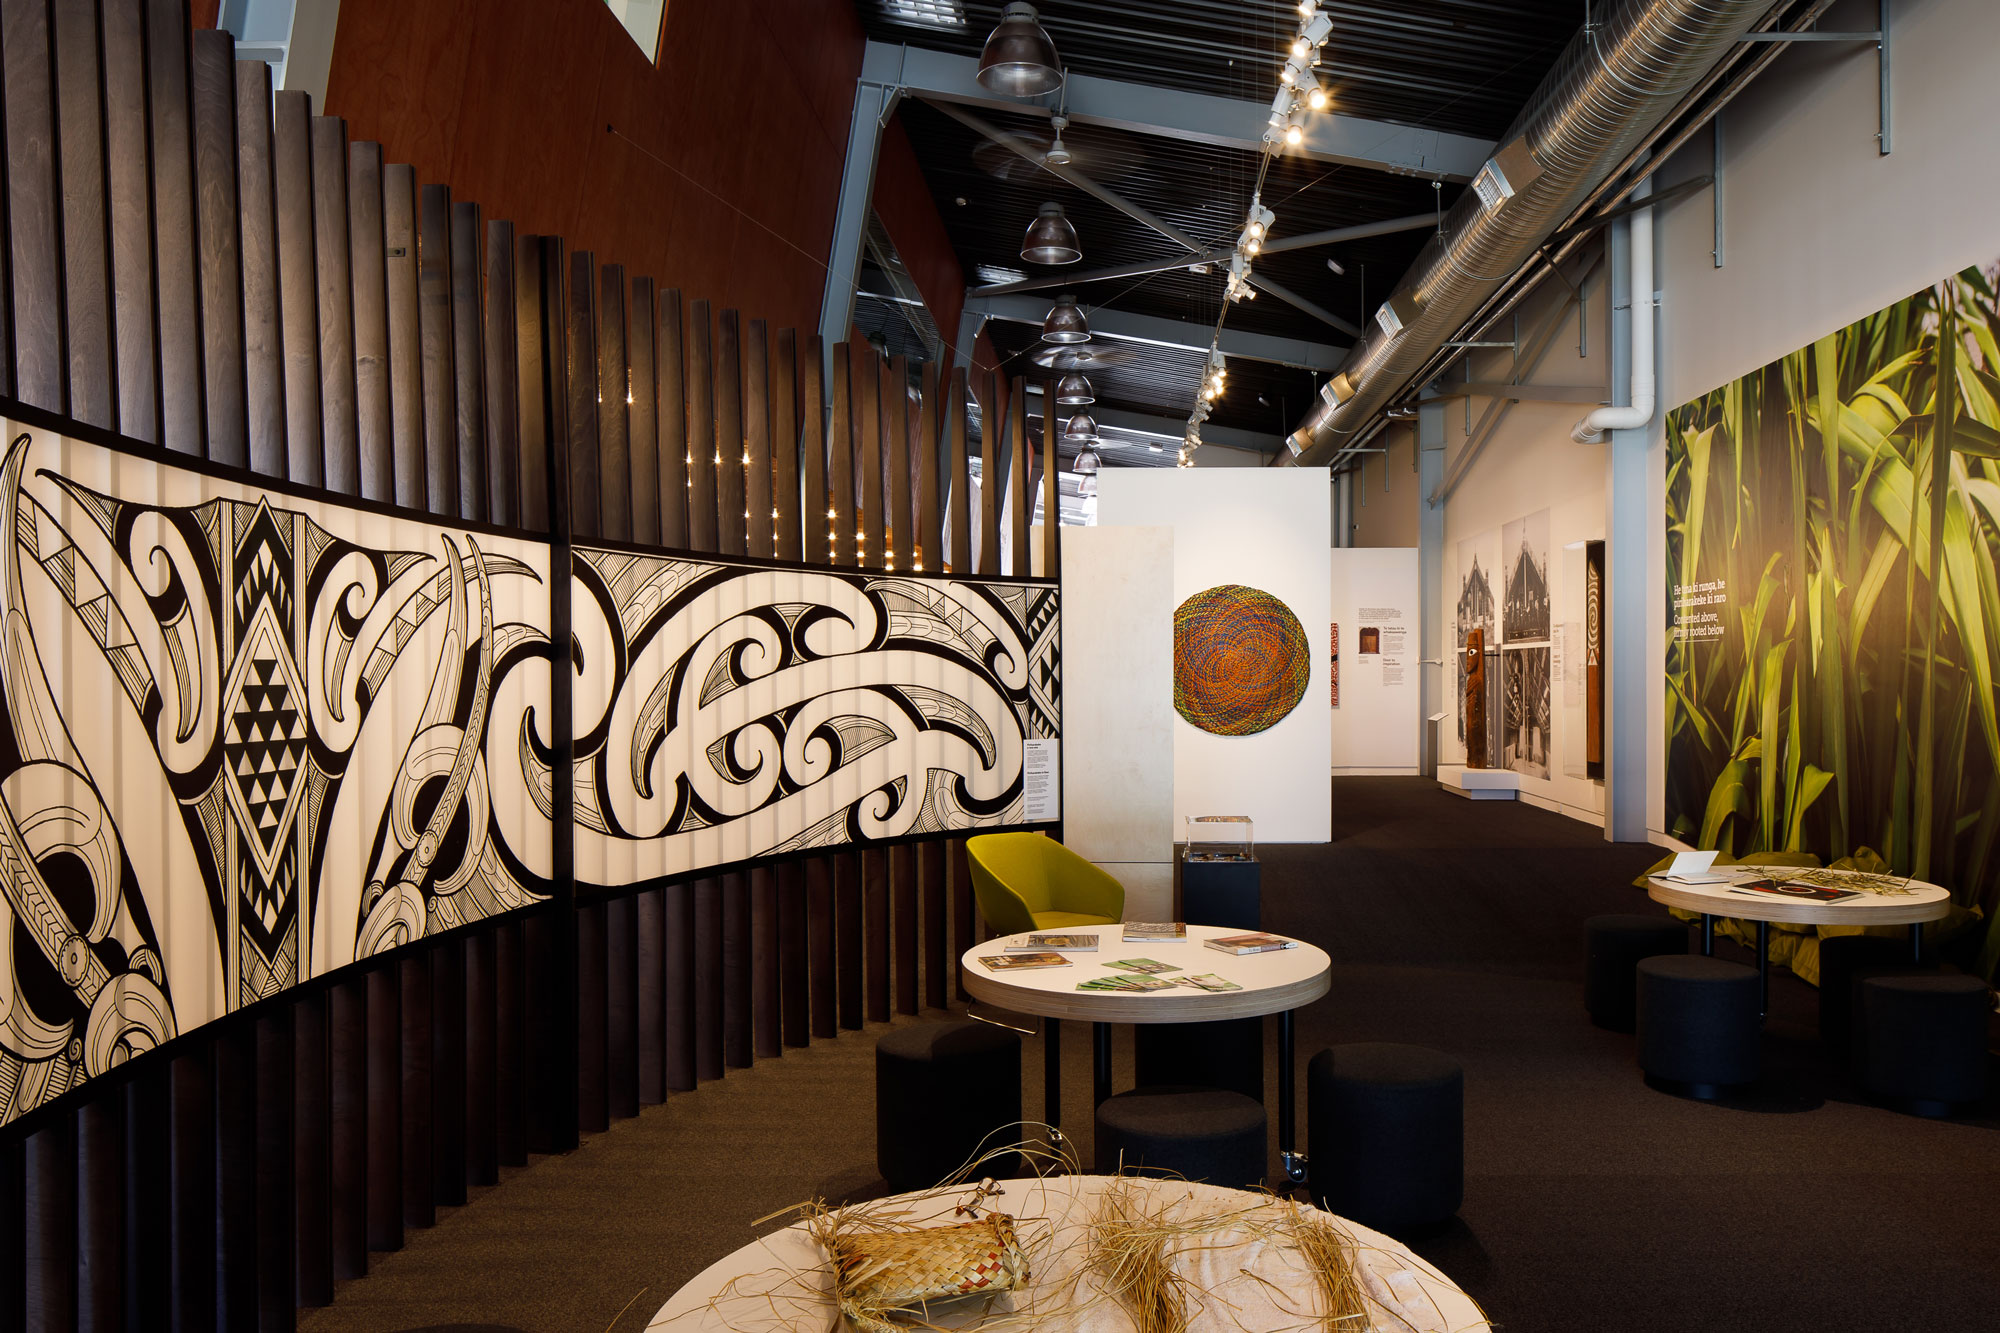 Te Awahou Nieuwe Stroom – Bossley Architects